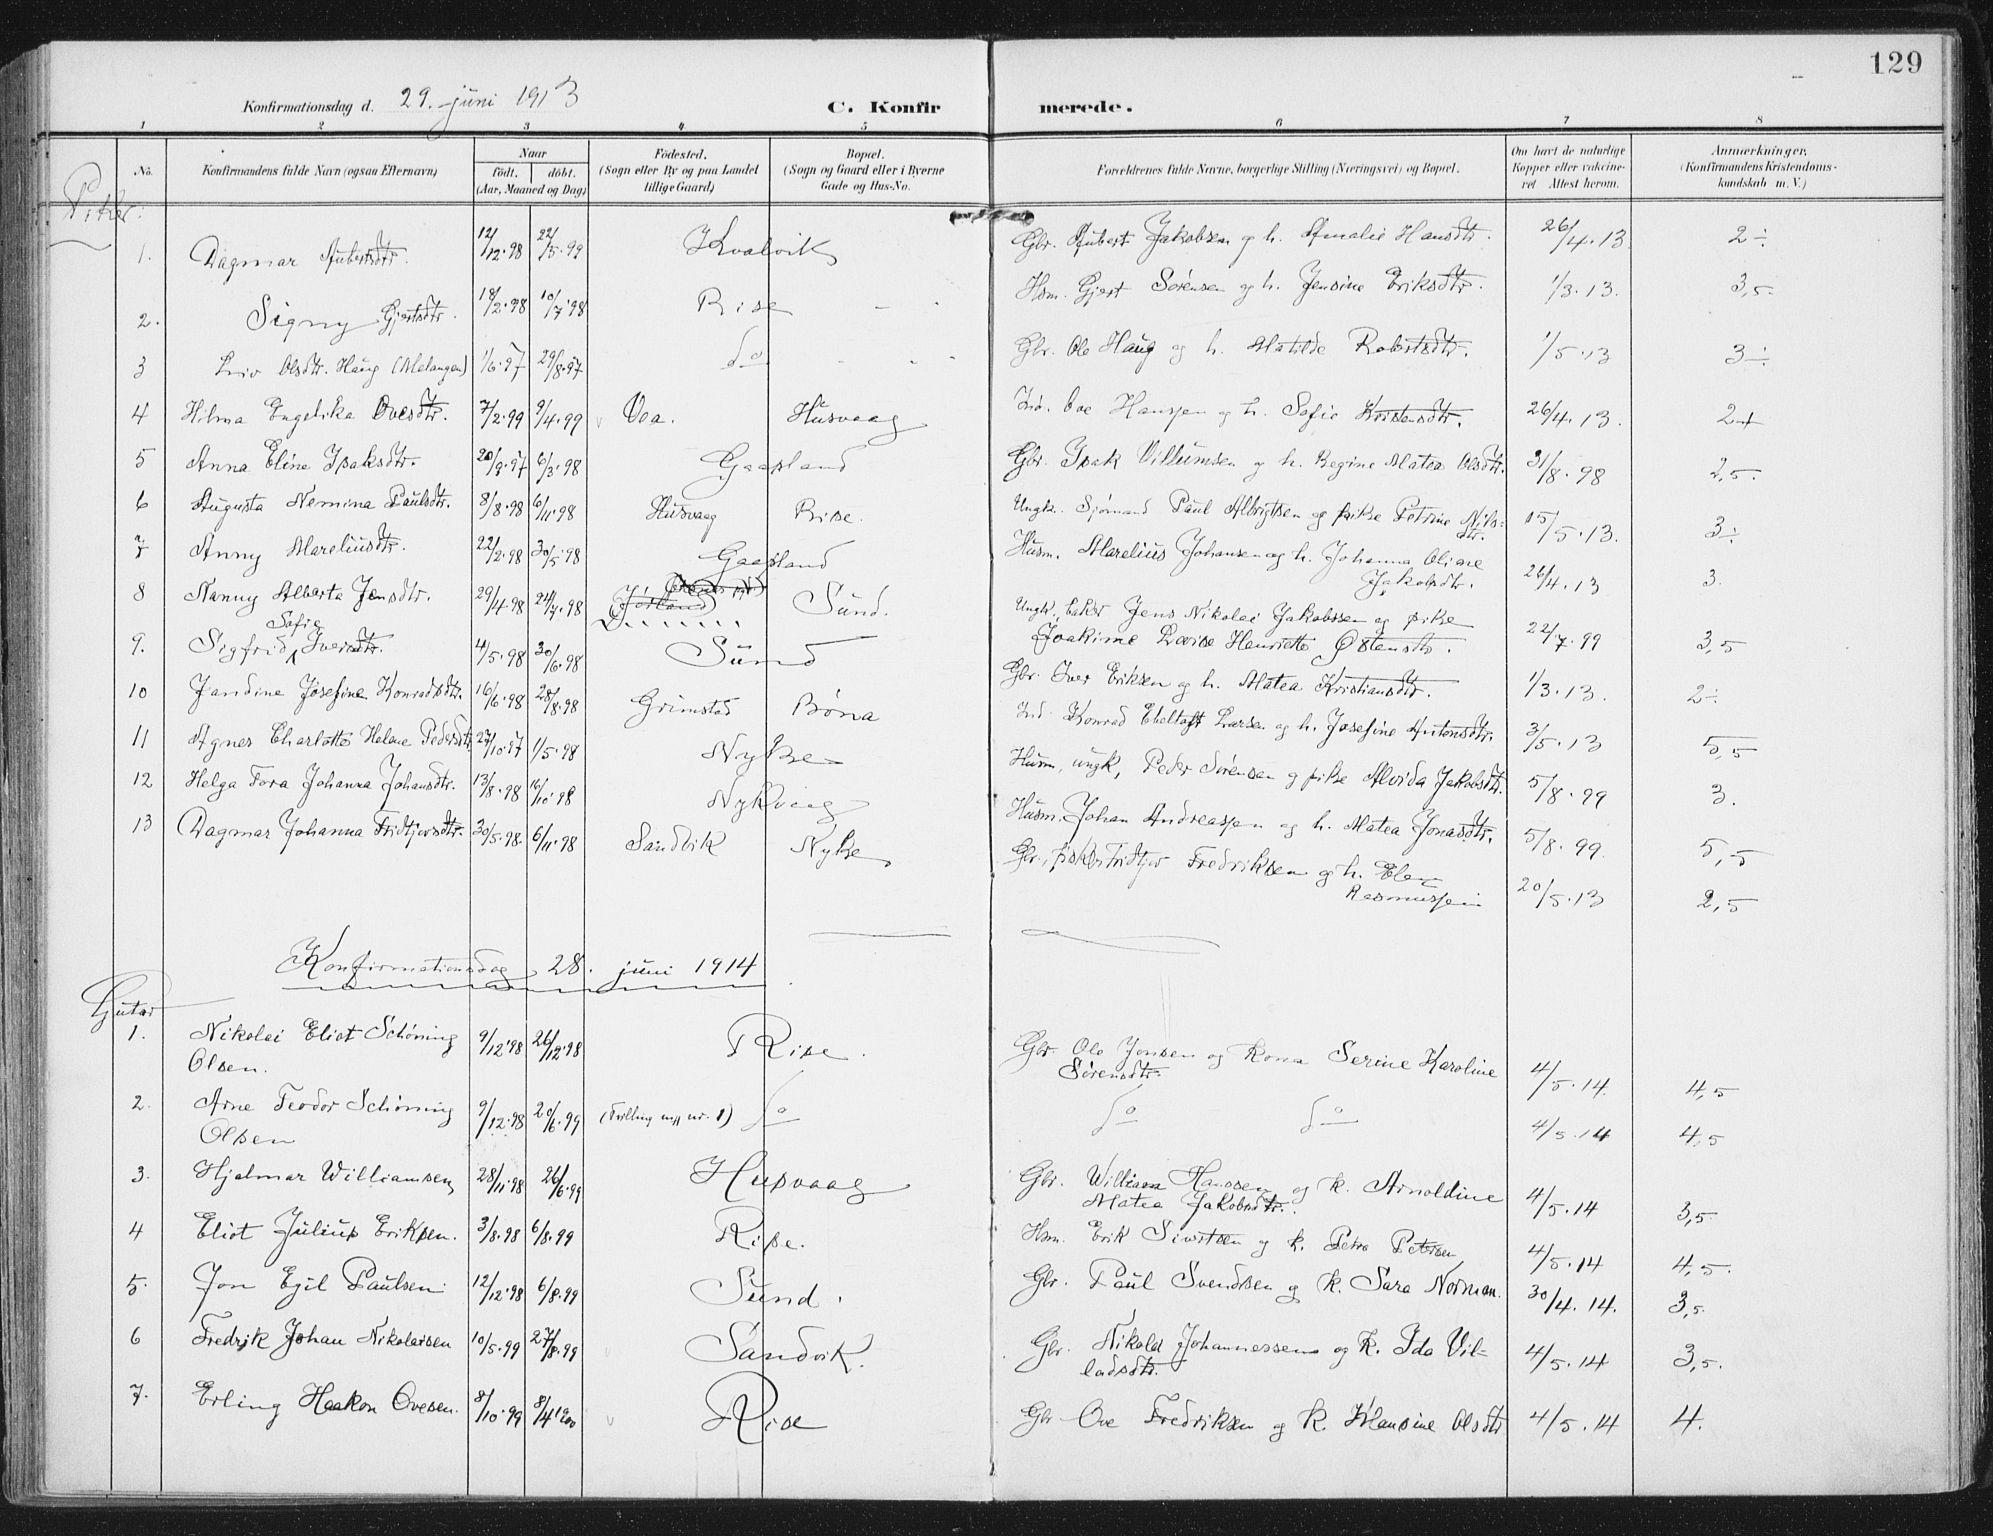 SAT, Ministerialprotokoller, klokkerbøker og fødselsregistre - Nordland, 892/L1321: Ministerialbok nr. 892A02, 1902-1918, s. 129